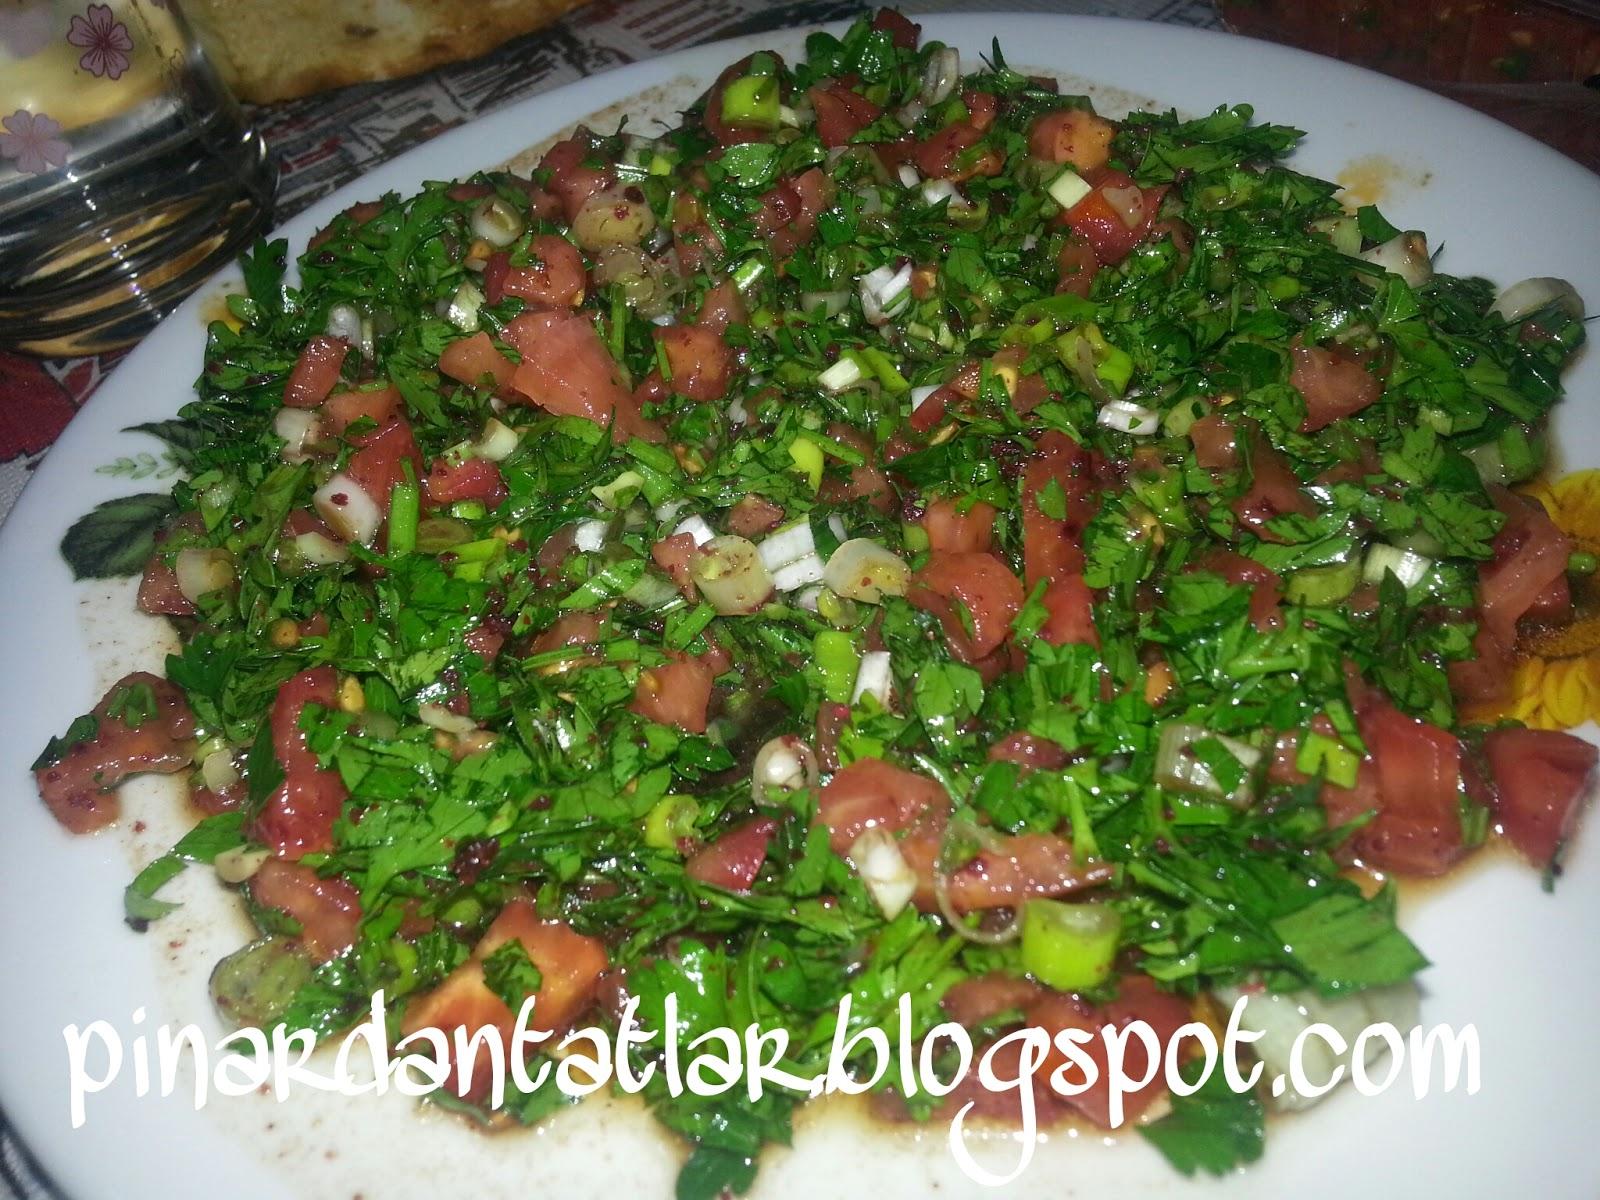 Soğan Salatası Tarifi – Salata Tarifleri